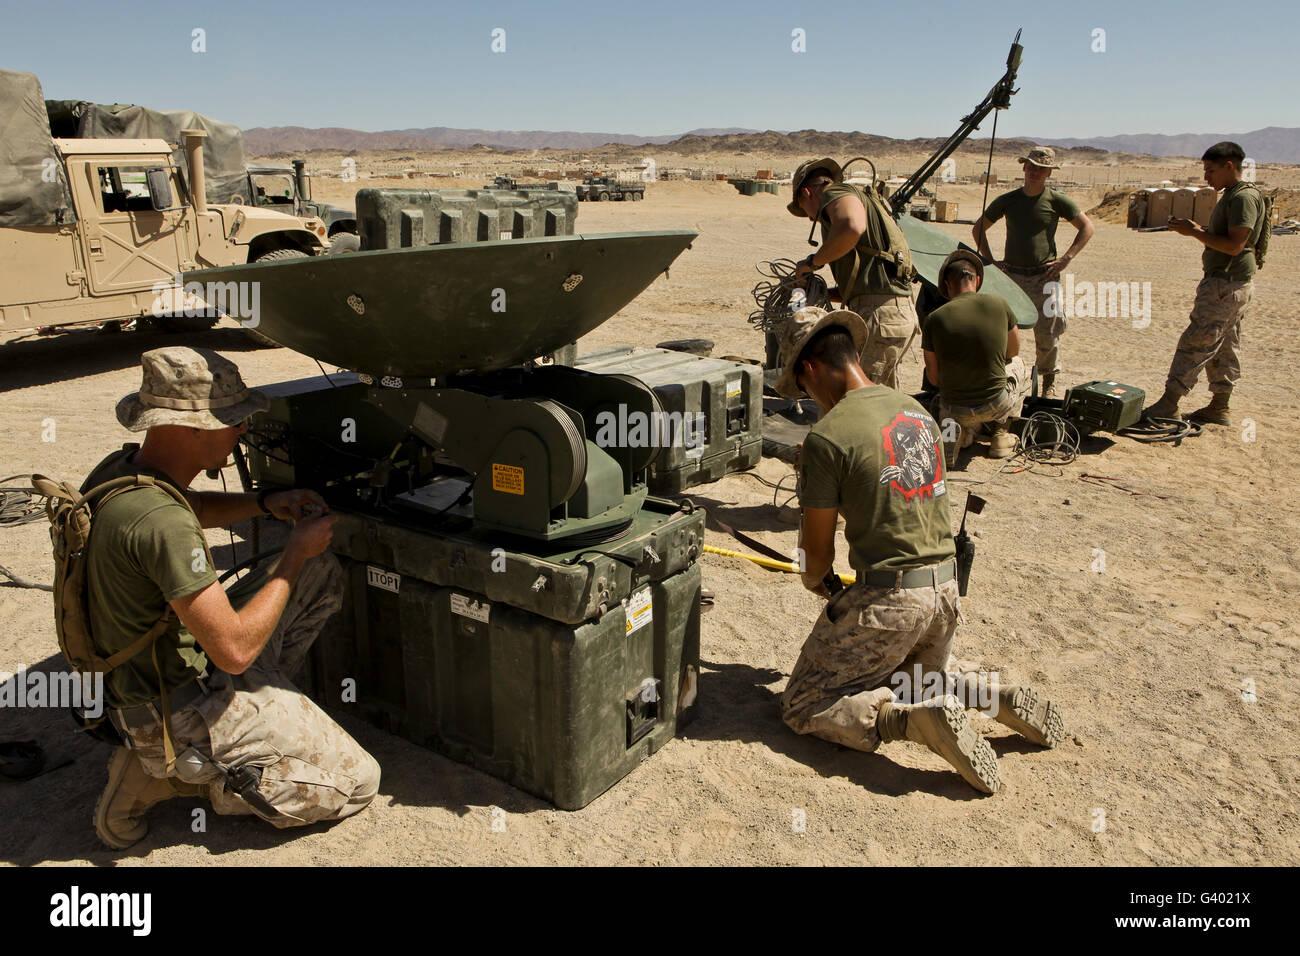 Les Marines américains monter une antenne satellite. Photo Stock